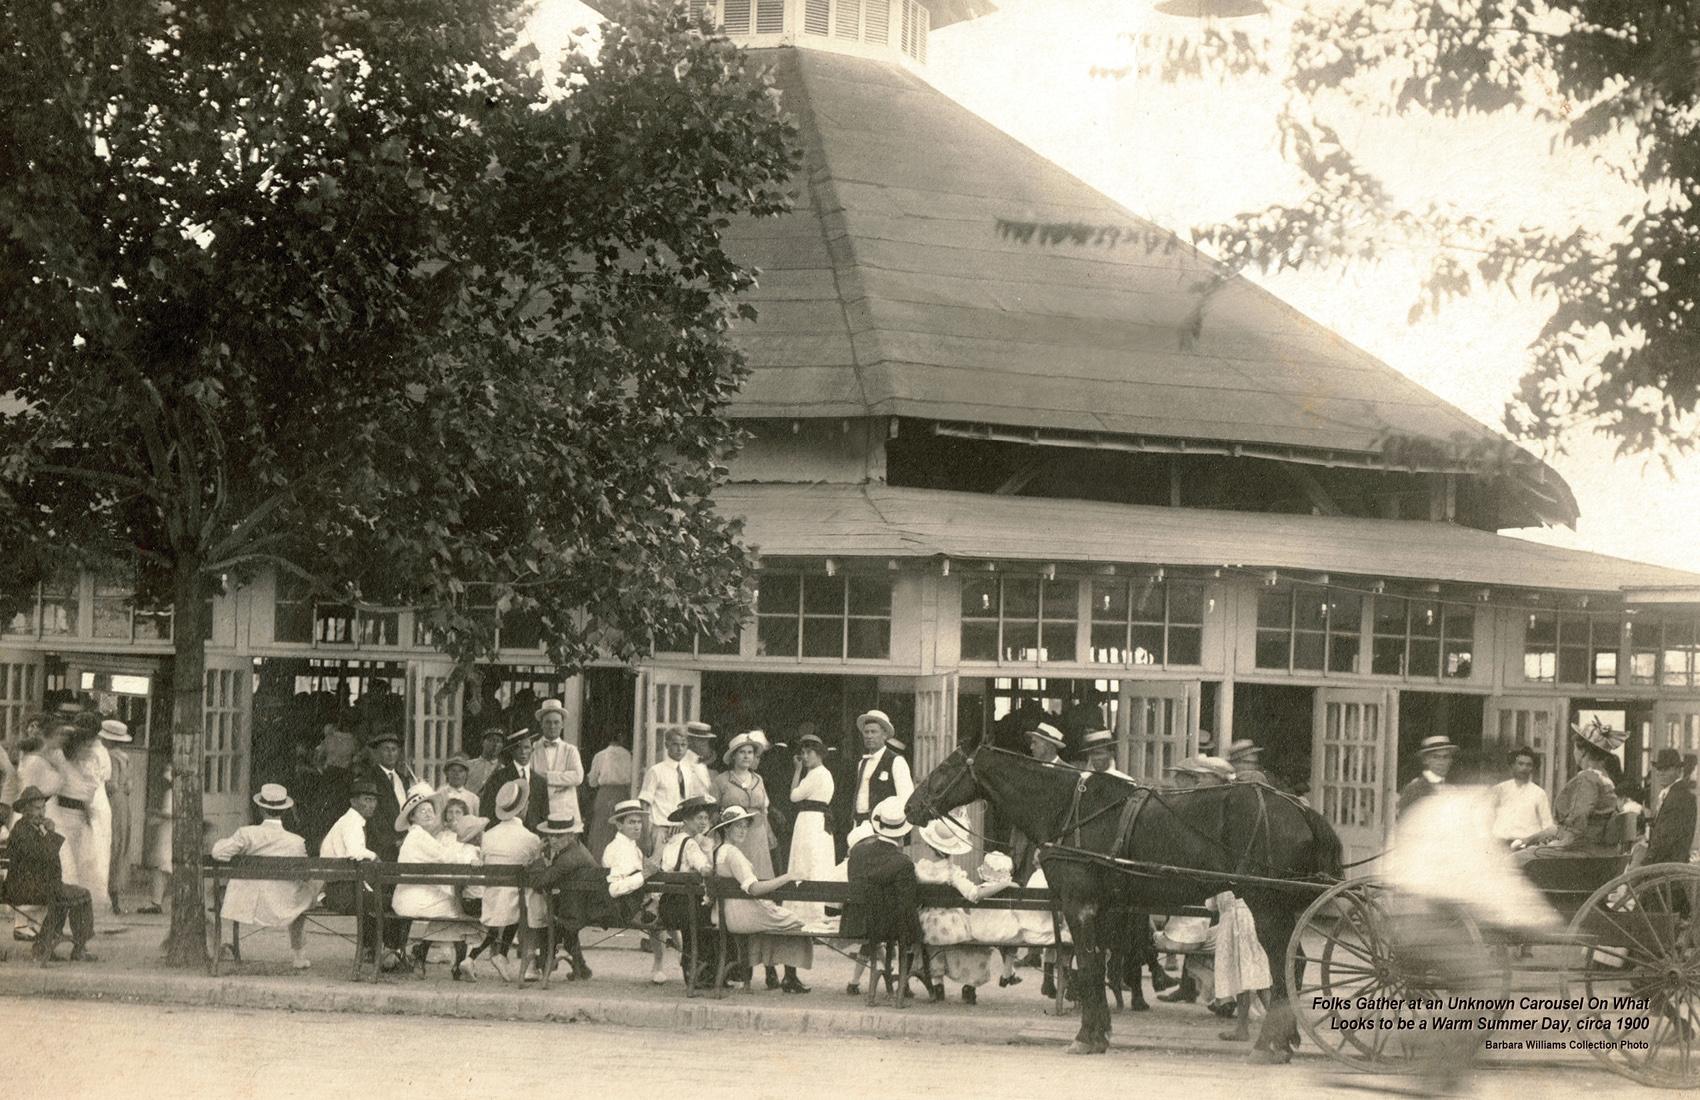 Circa-1900-busy-carousel-B-Williams-Archive-CNT-center-Aug-12